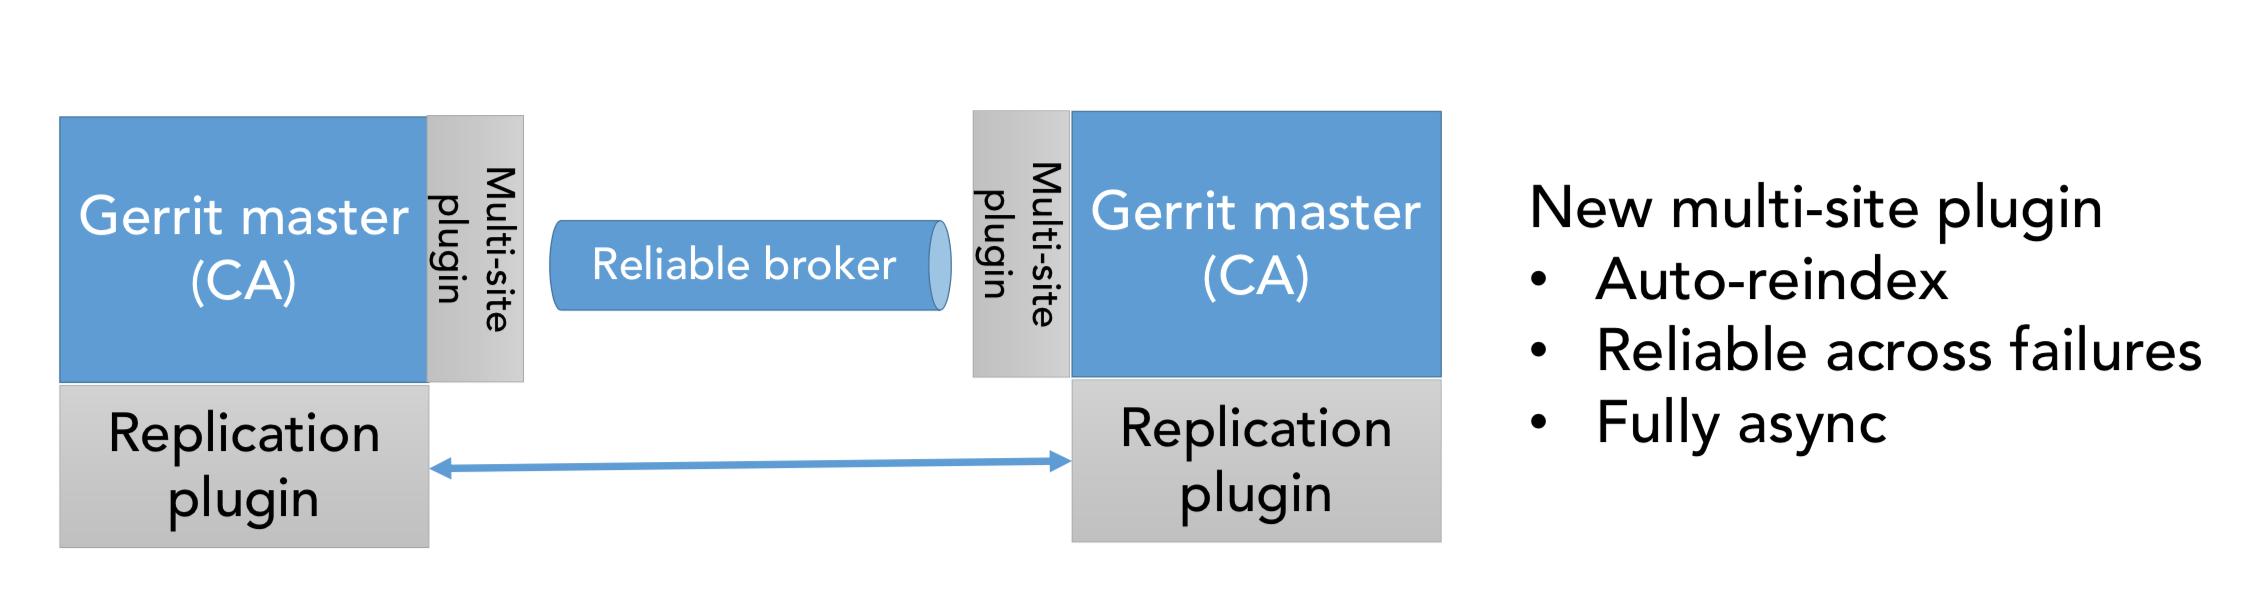 Gerrit: OpenSource and Multi-Site | GerritForge Blog